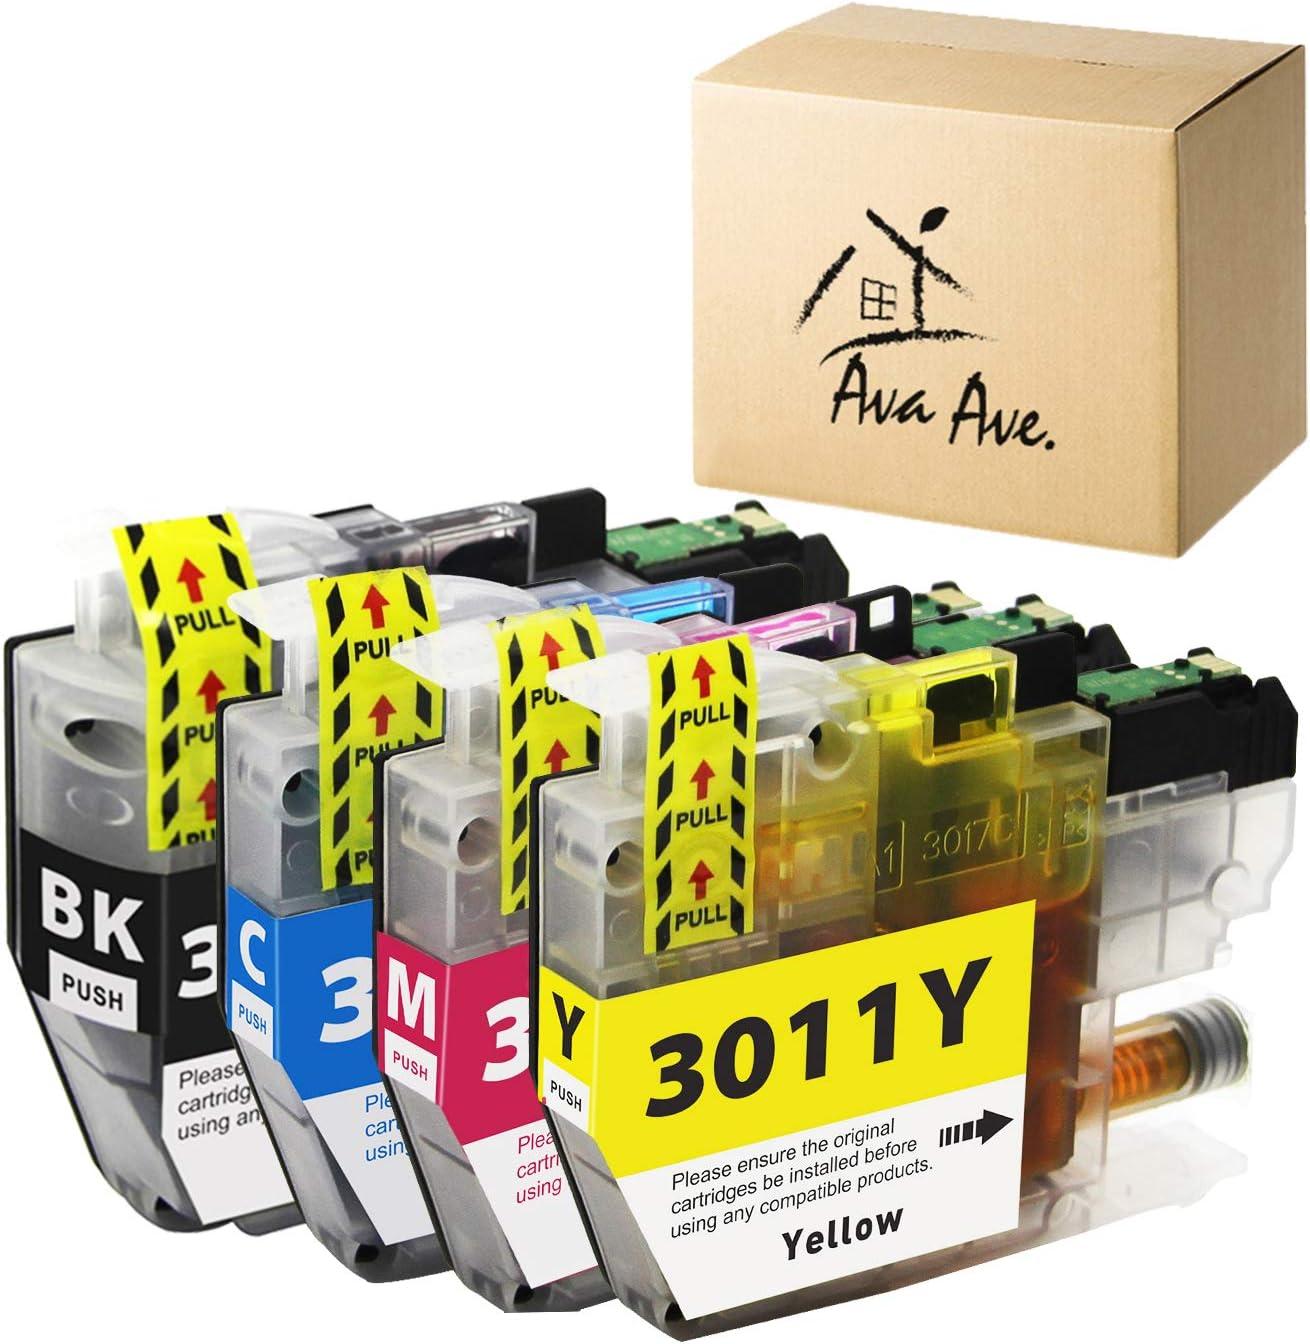 DIGITONER Compatible Ink Cartridge Replacement for Brother LC3011 LC-3011 LC 3011 Ink Cartridges Brother MFC-J491DW MFC-J497DW MFC-J690DW MFC-J895DW Printer 1 Black 1 Cyan 1 Magenta 1 Yellow, 4 Pack